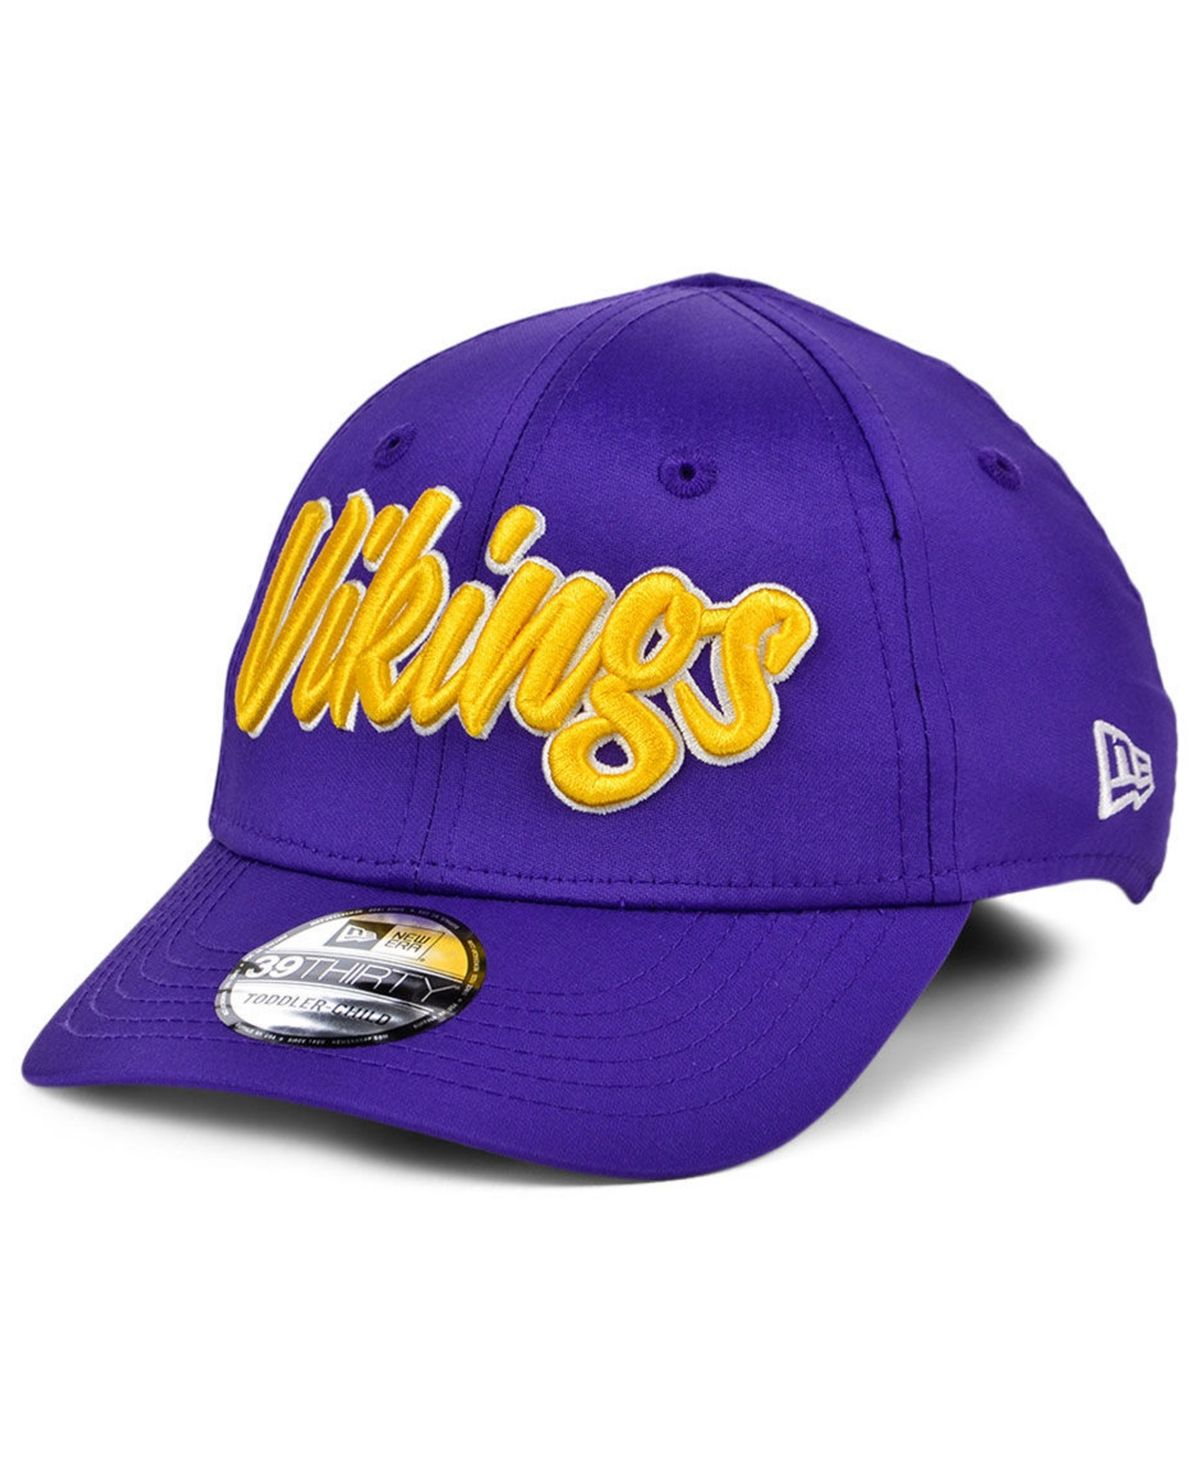 New Era Boys Minnesota Vikings On Field Sideline Home 39thirty Cap Purple New Era Boot Shoes Women Minnesota Vikings